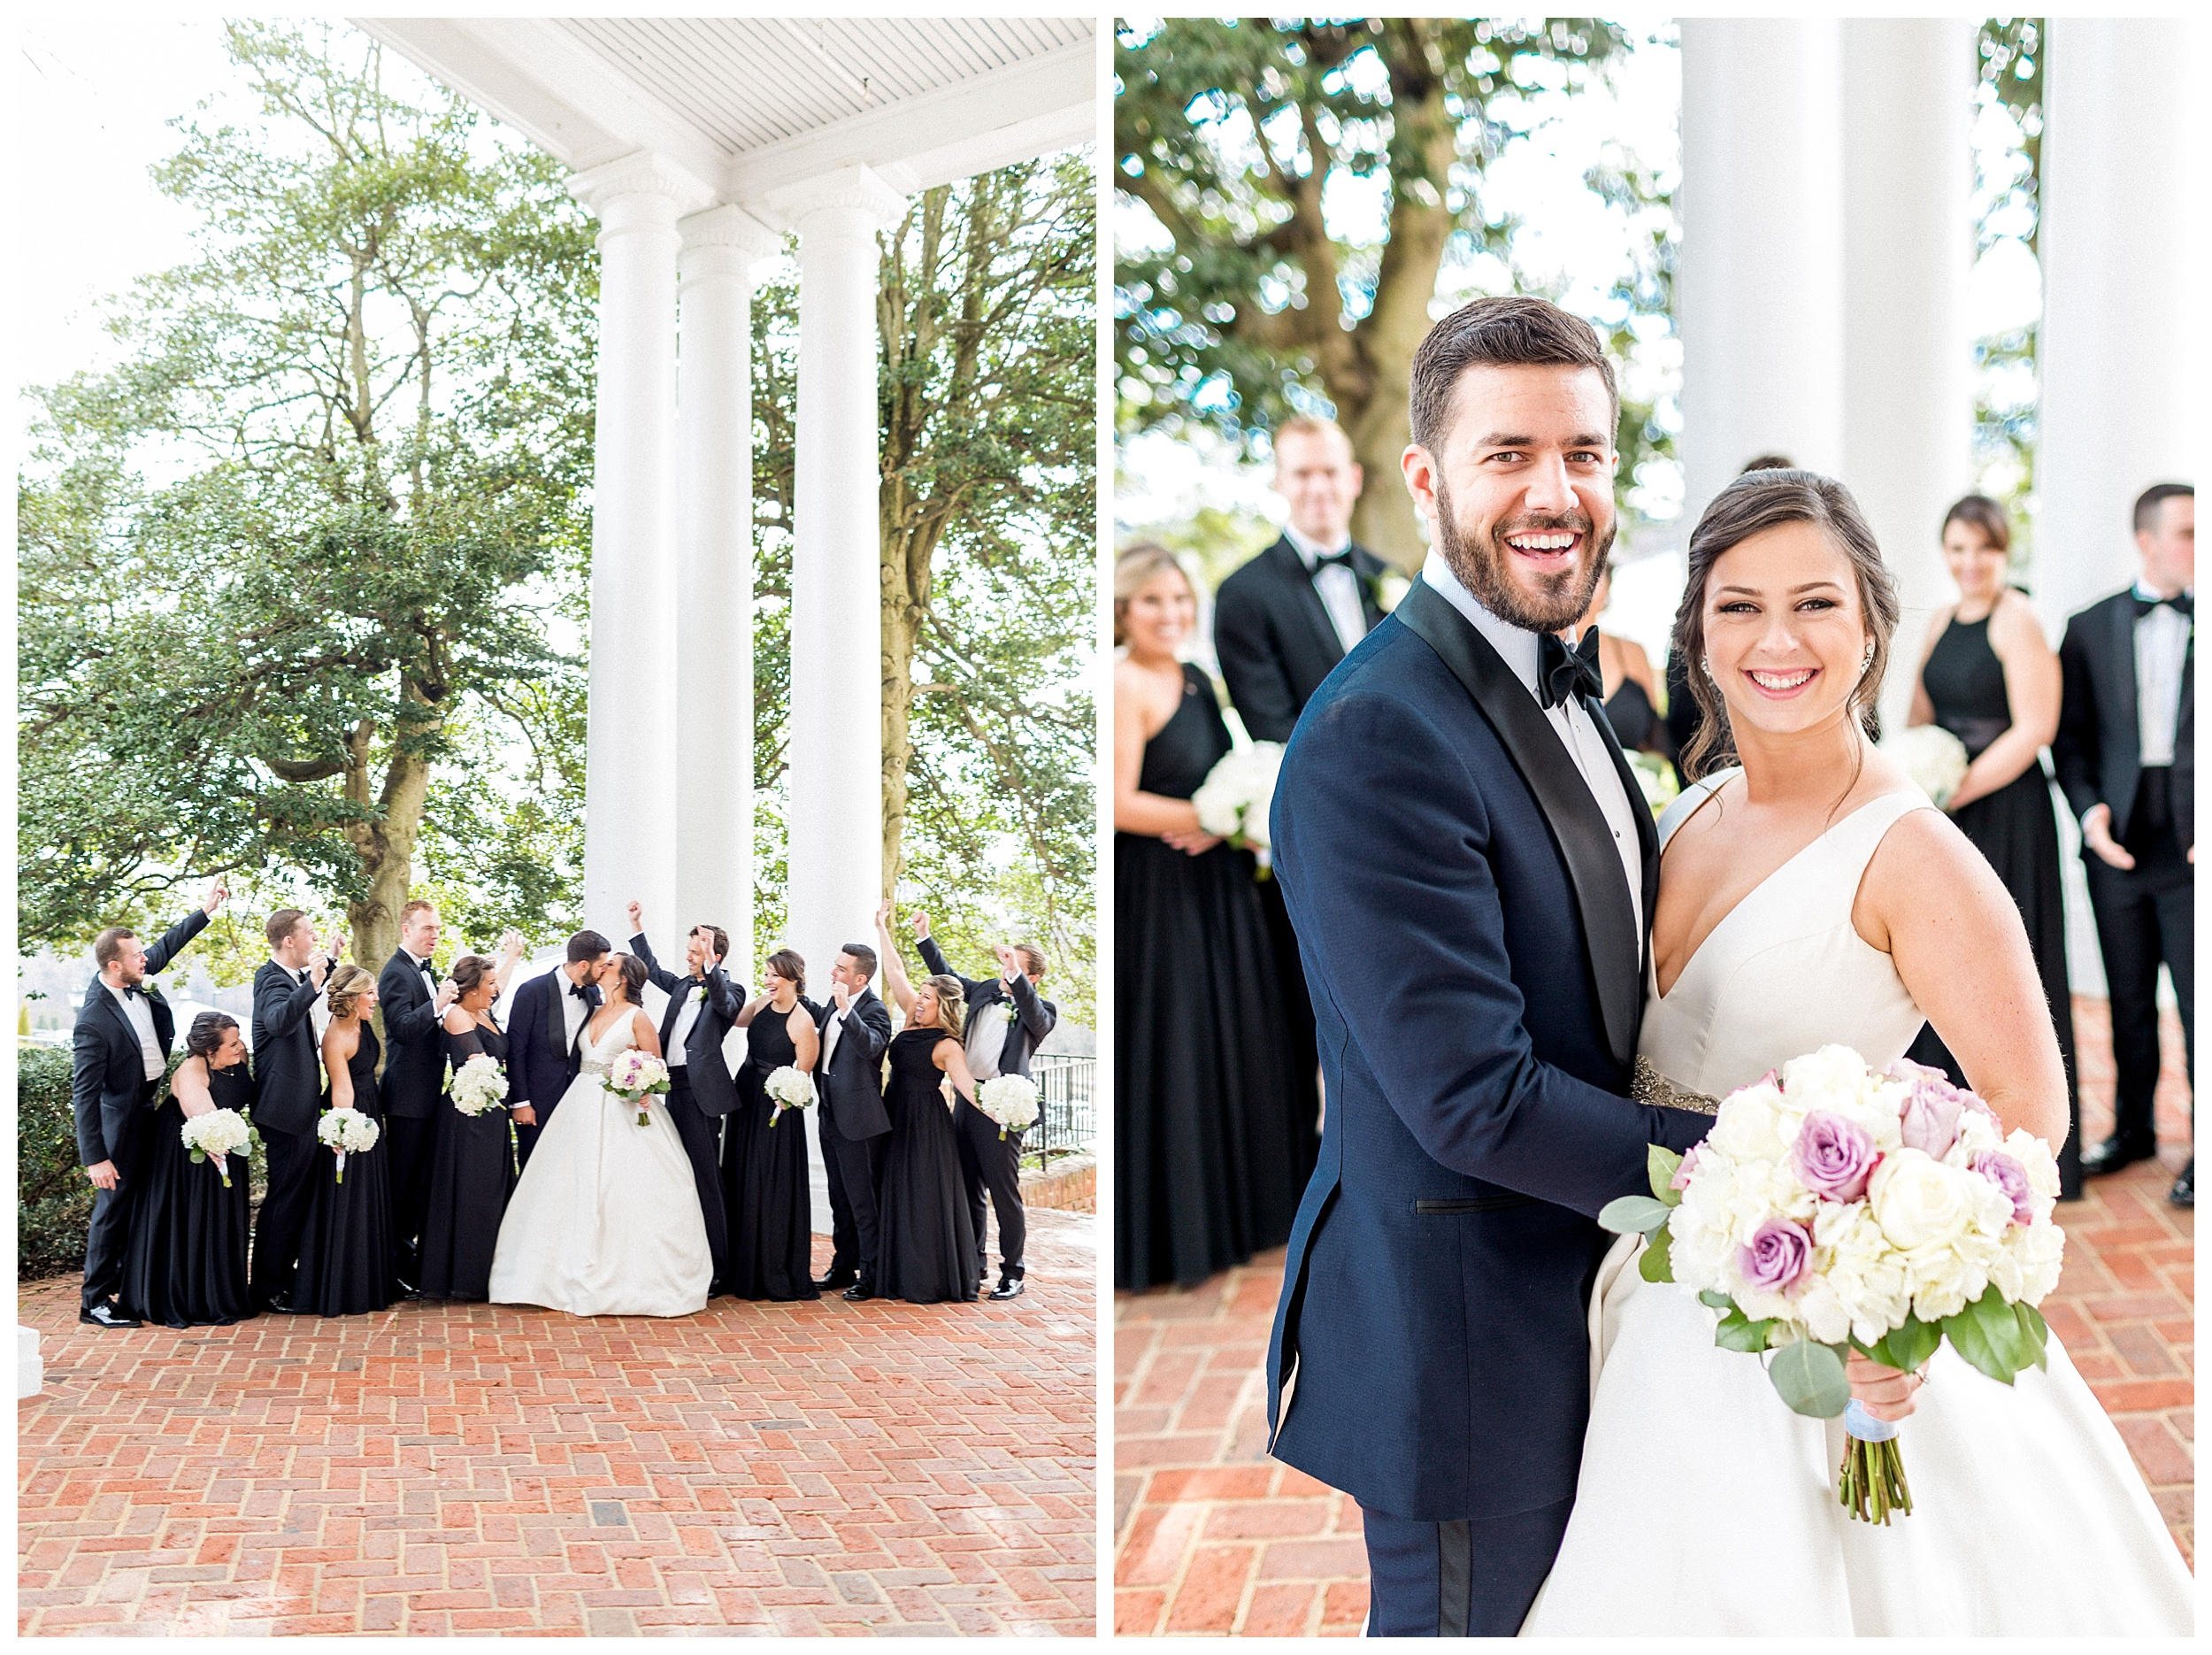 Country Club of Virginia Wedding | Richmond Wedding Photographer_0086.jpg